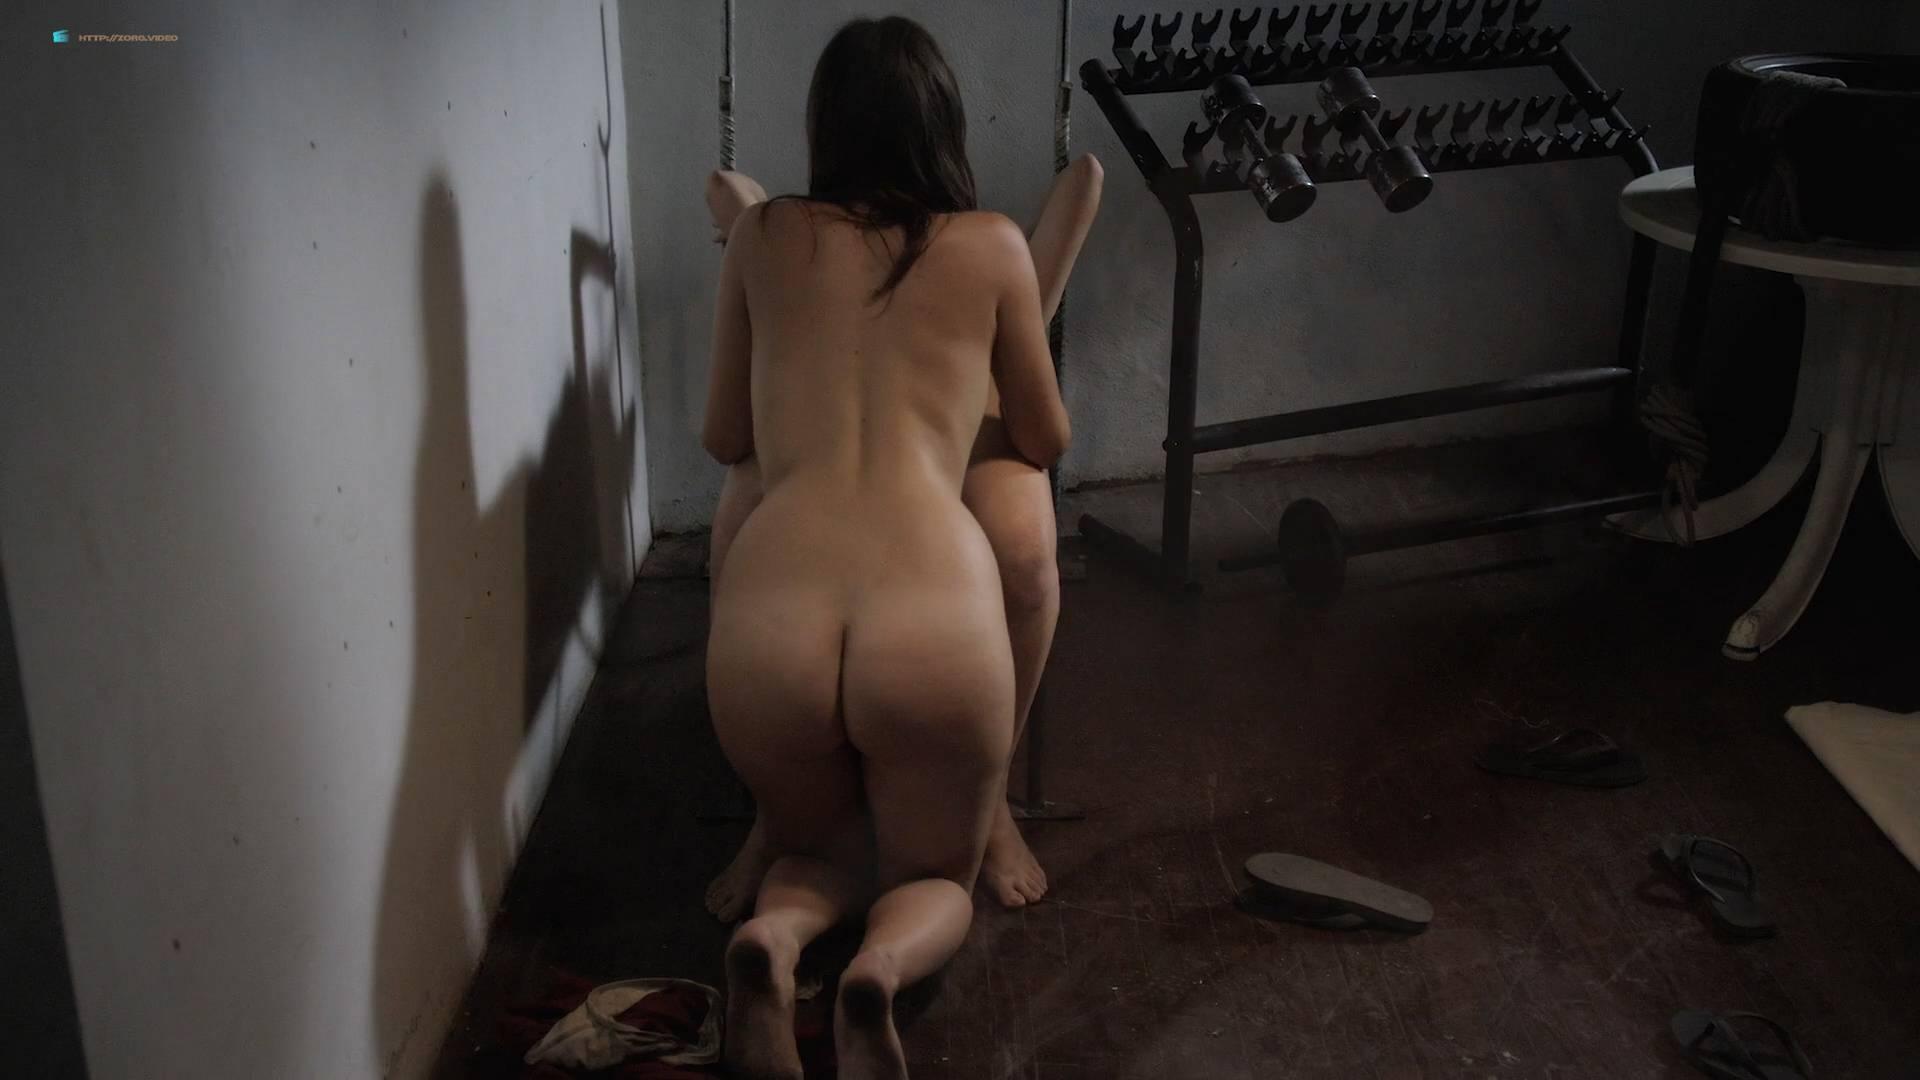 Kelly Mccart Nude Full Frontal Katrina Grey Nude Lesbian -5411